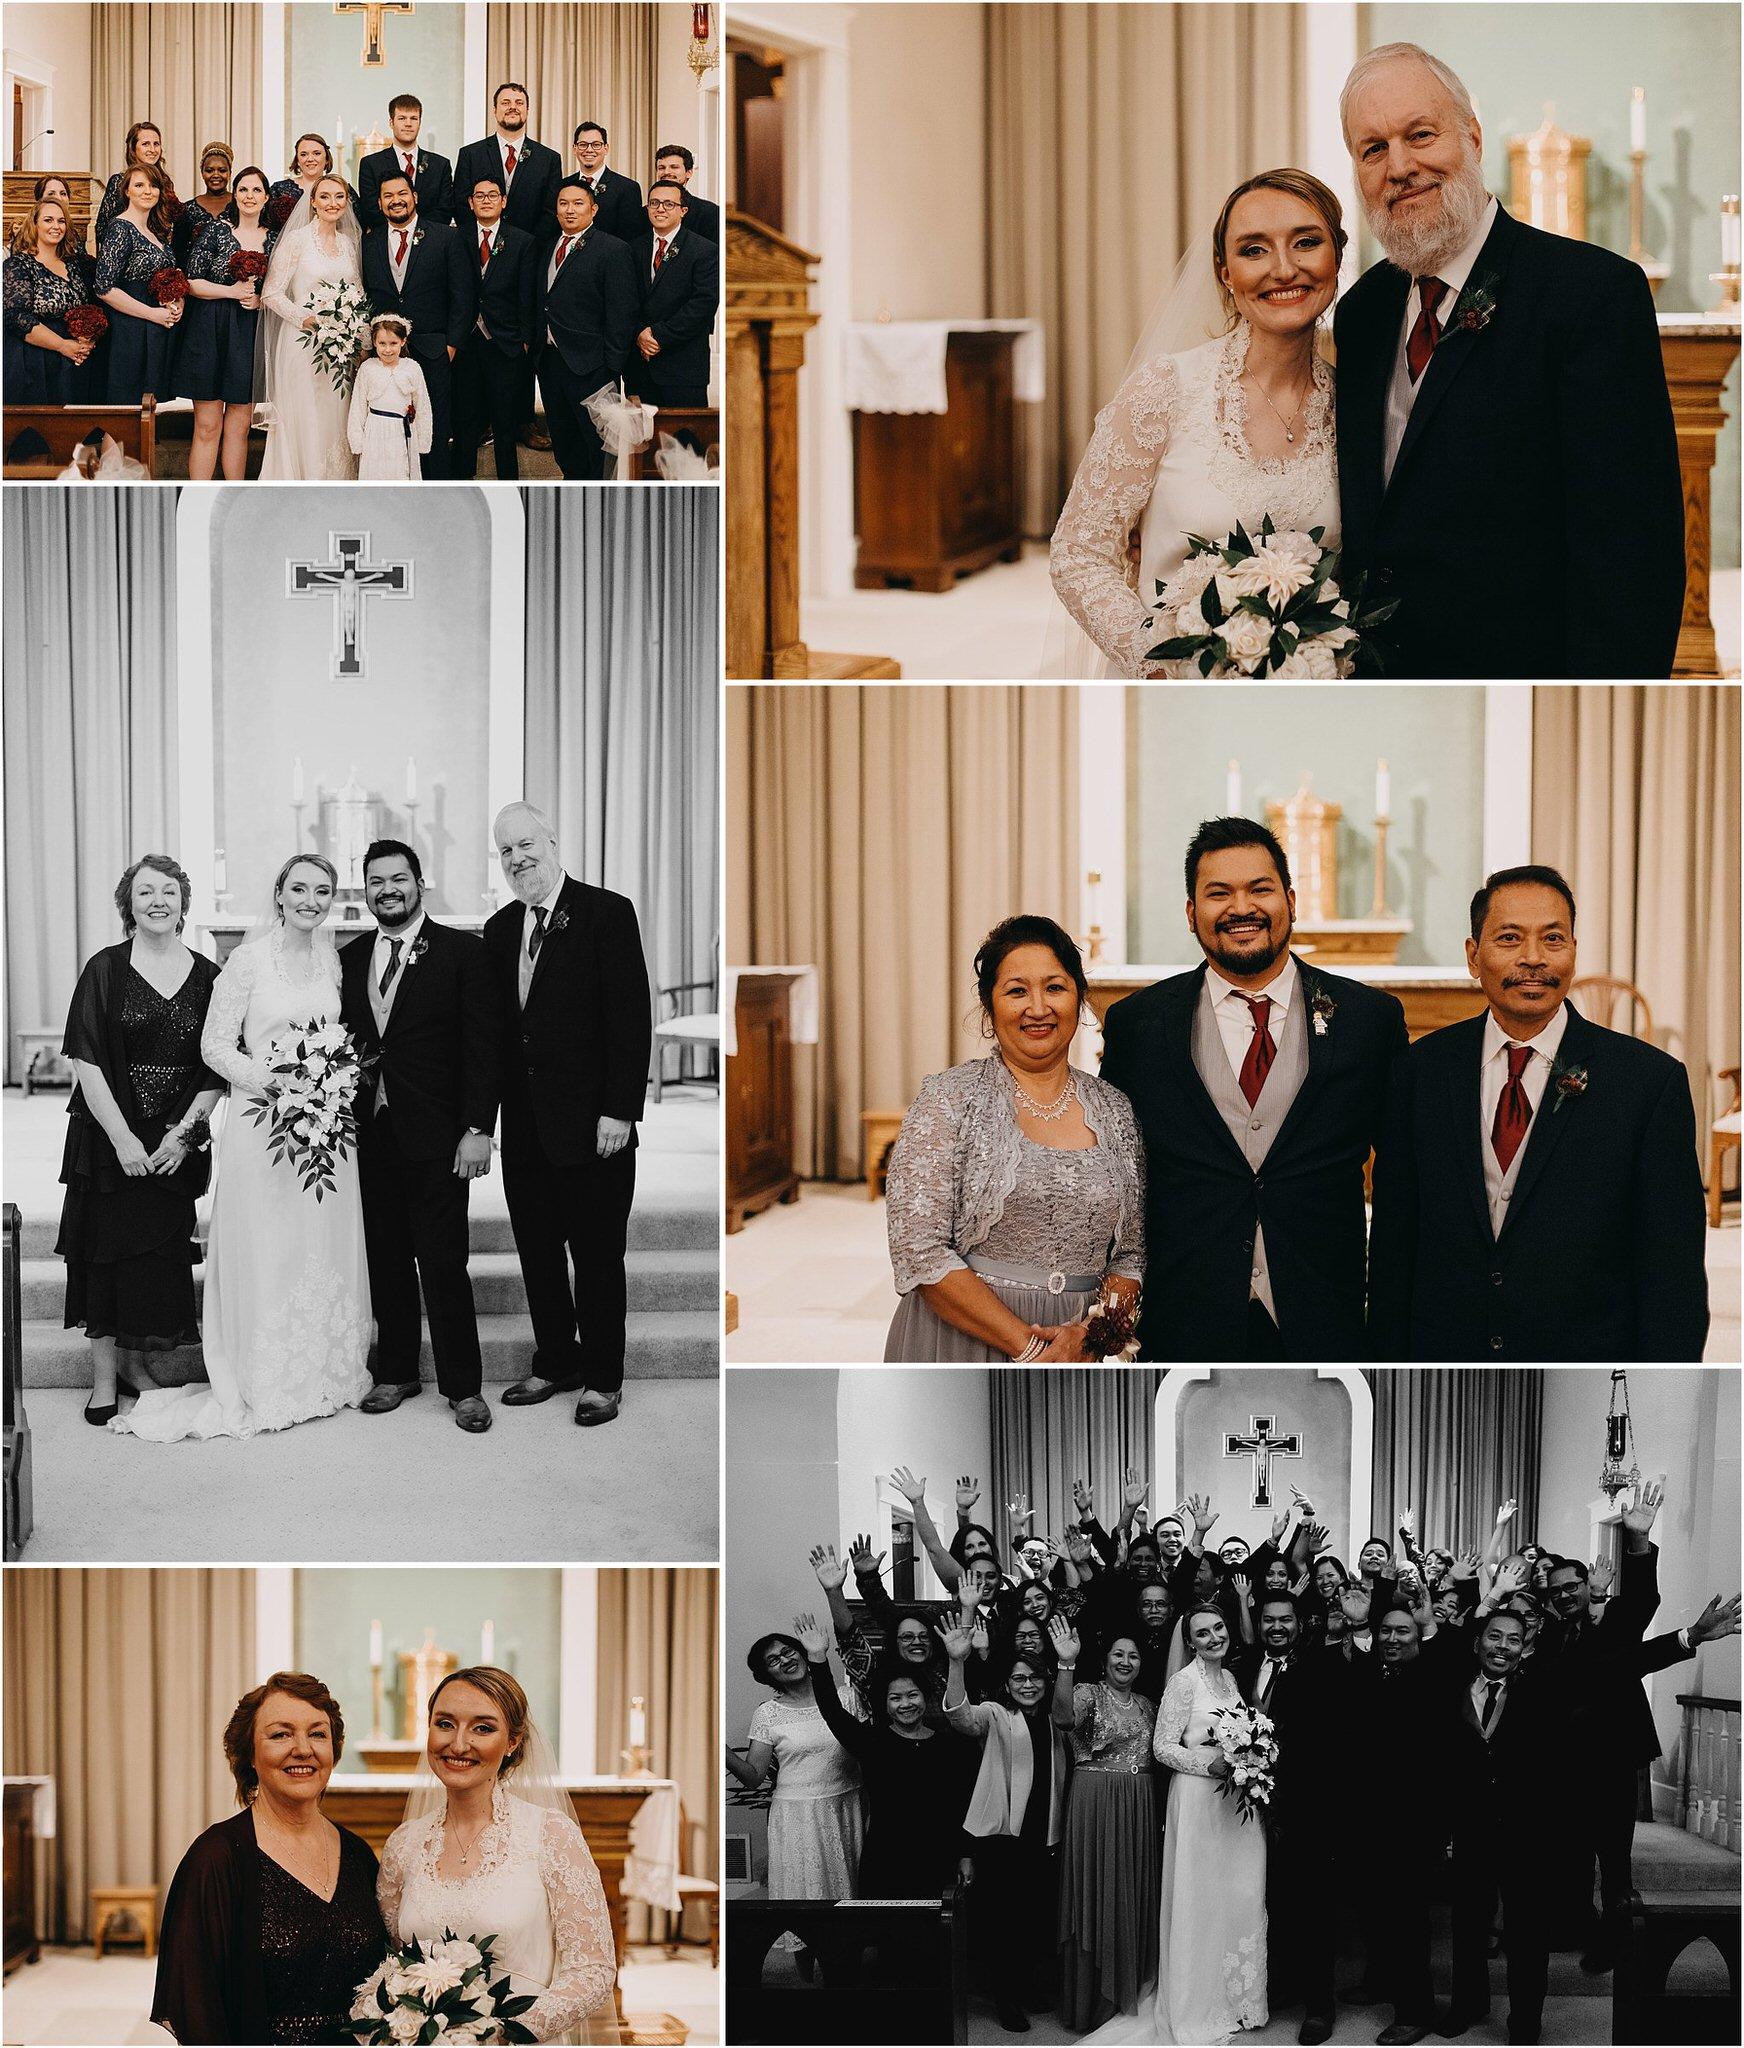 katy-robin-married-in-mukilteo-wedding36.jpg